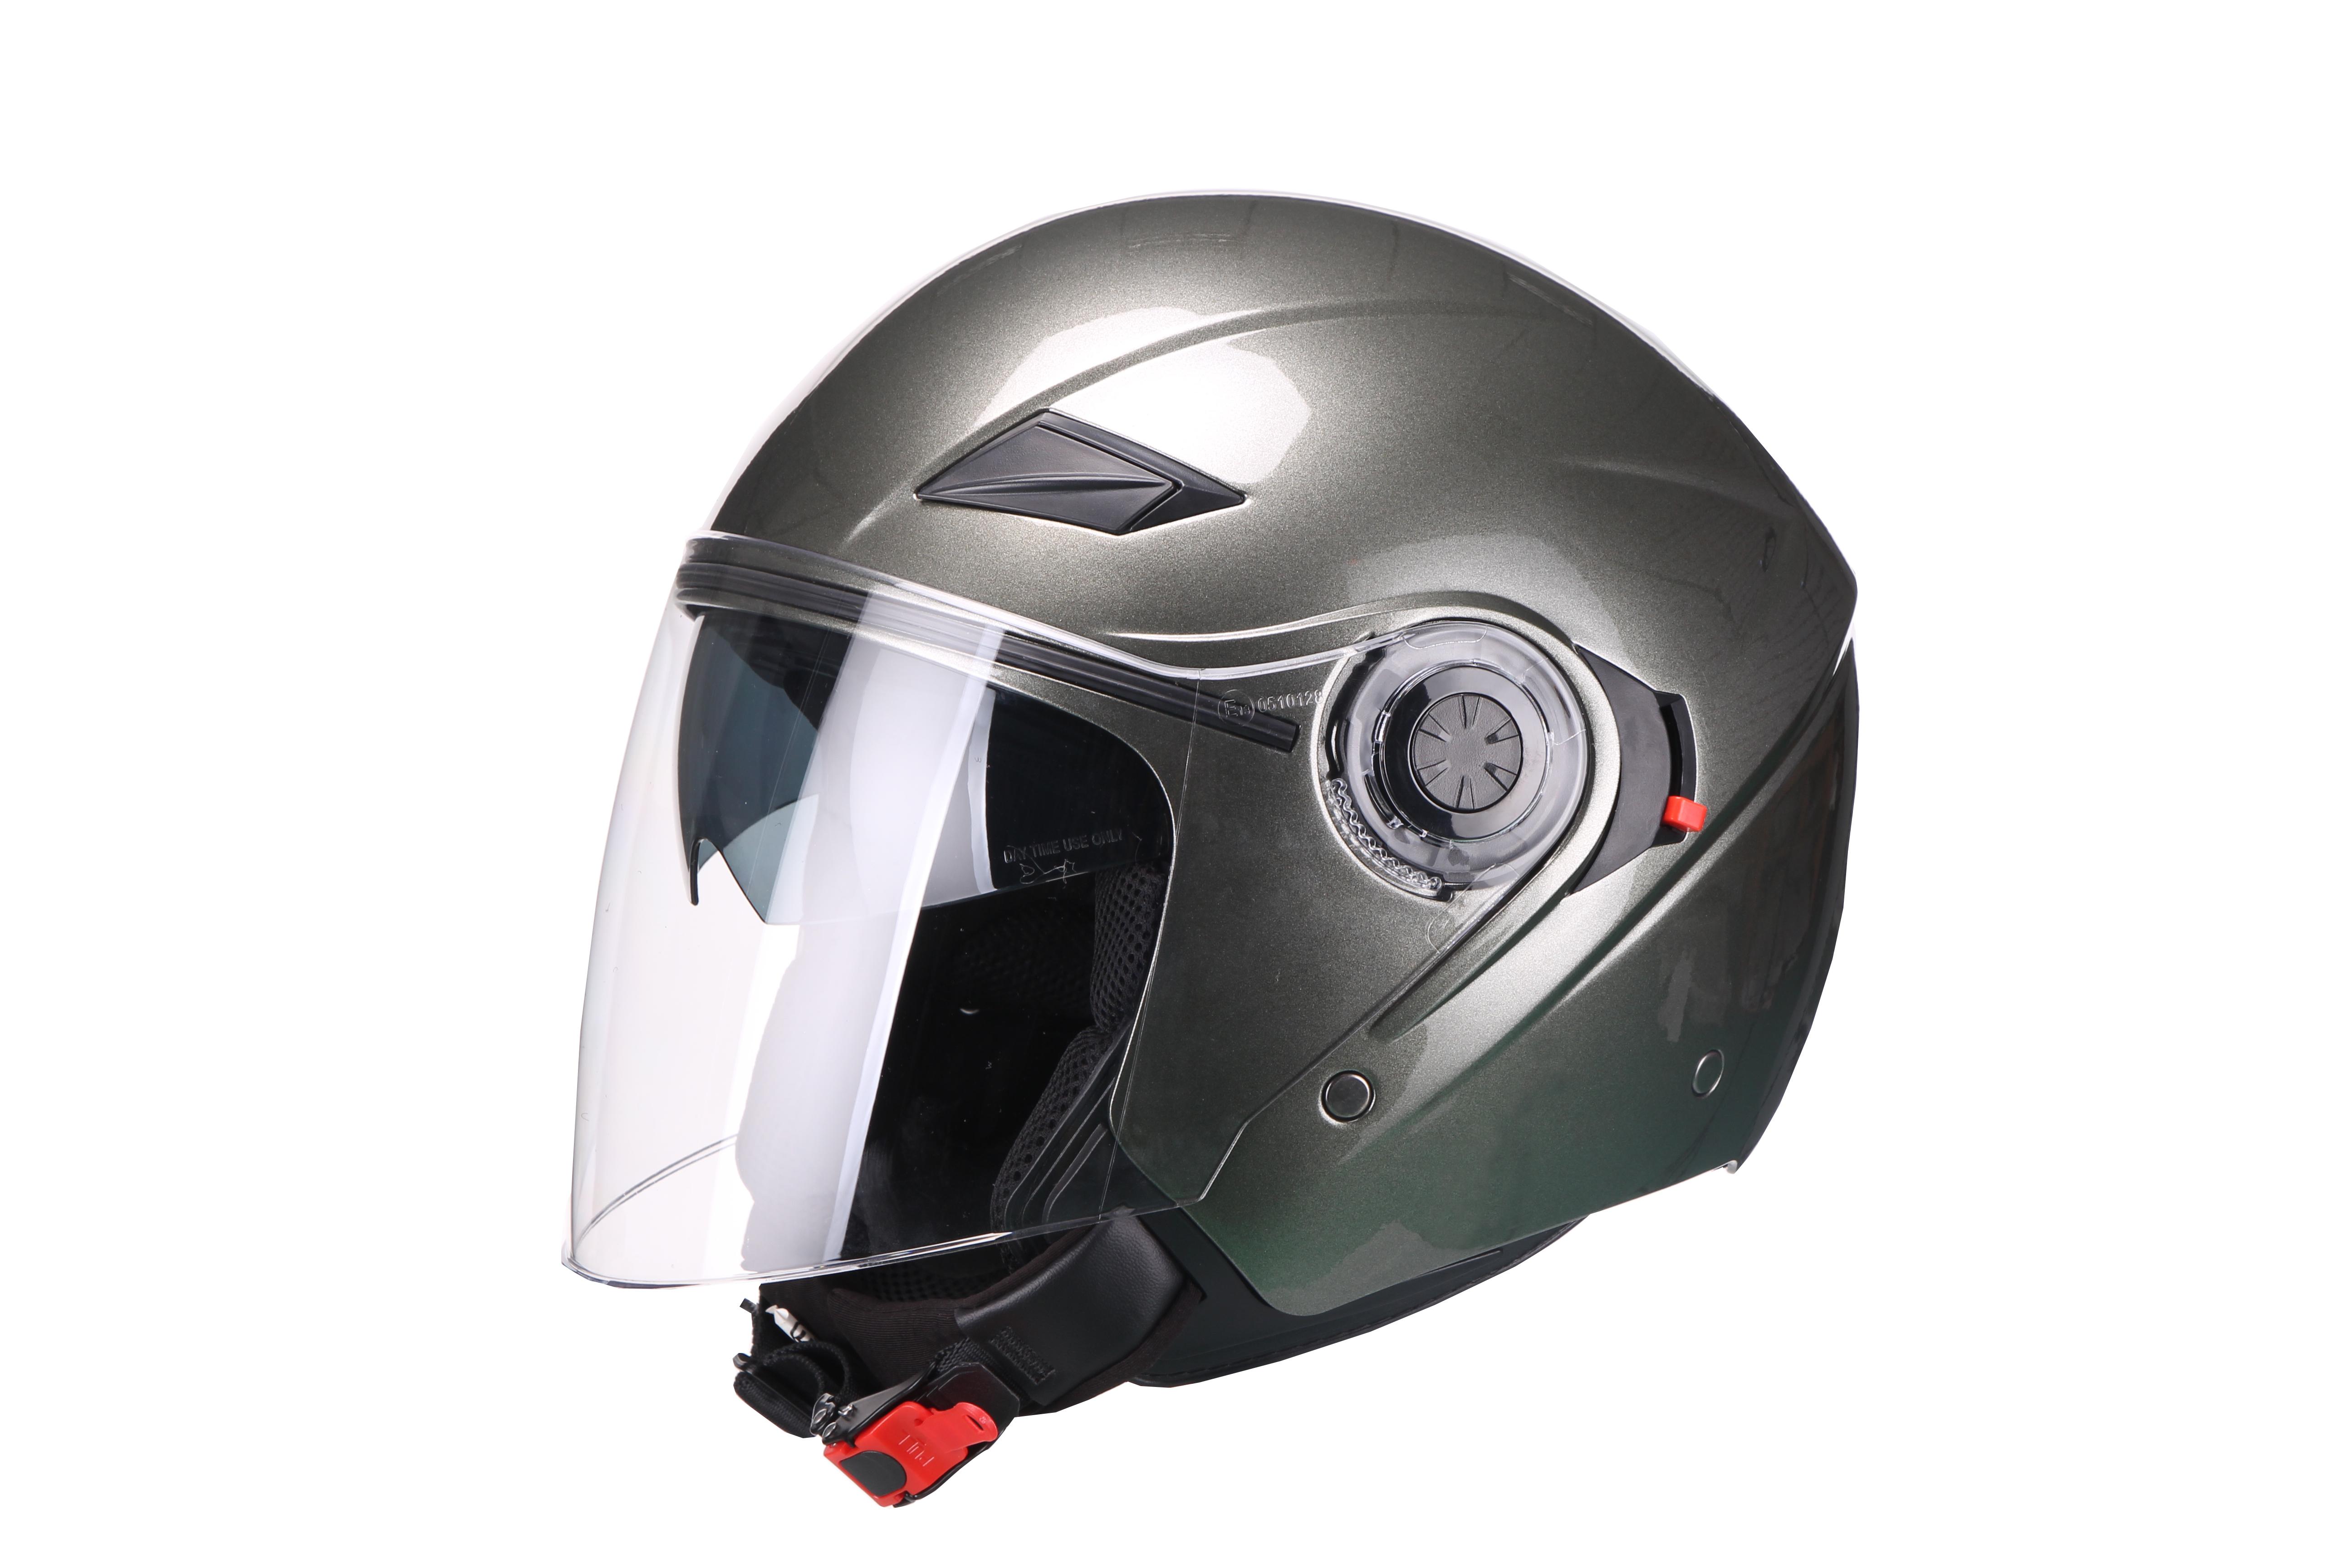 Vito Amaro Jet helm